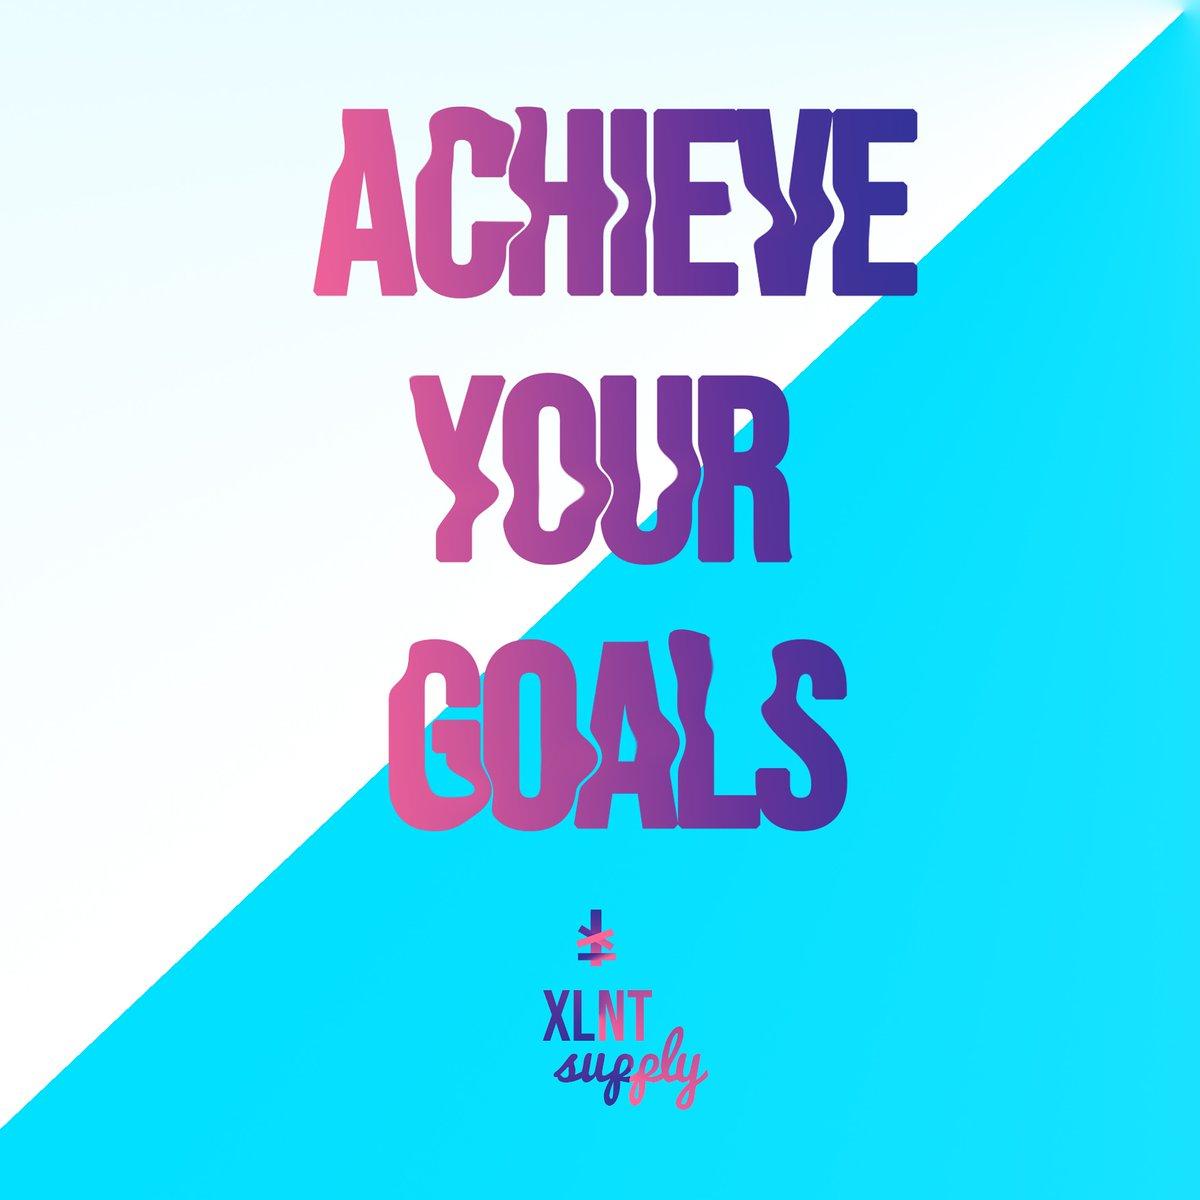 ACHIEVE YOUR GOALS!!! #xlntsupply #xlntsquad #achieveyourgoals #dailymotivation #doitforyourselfpic.twitter.com/YG773zbAF3